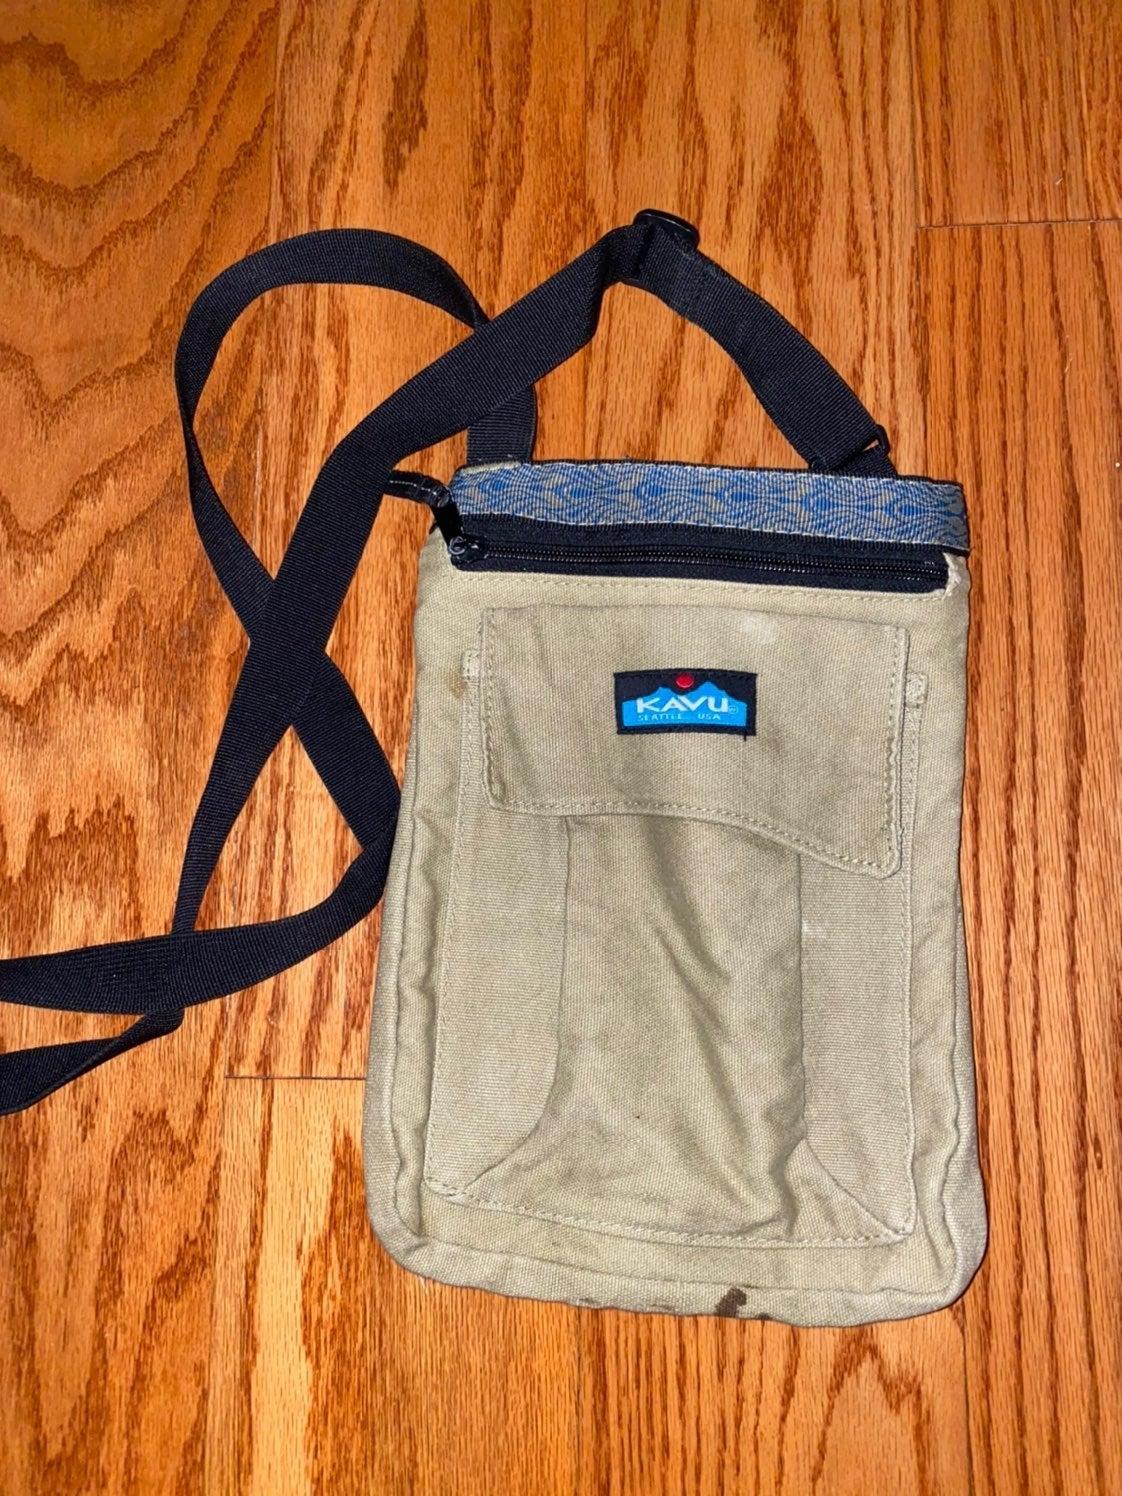 Kavu Crossbody Purse Adjustable Bag